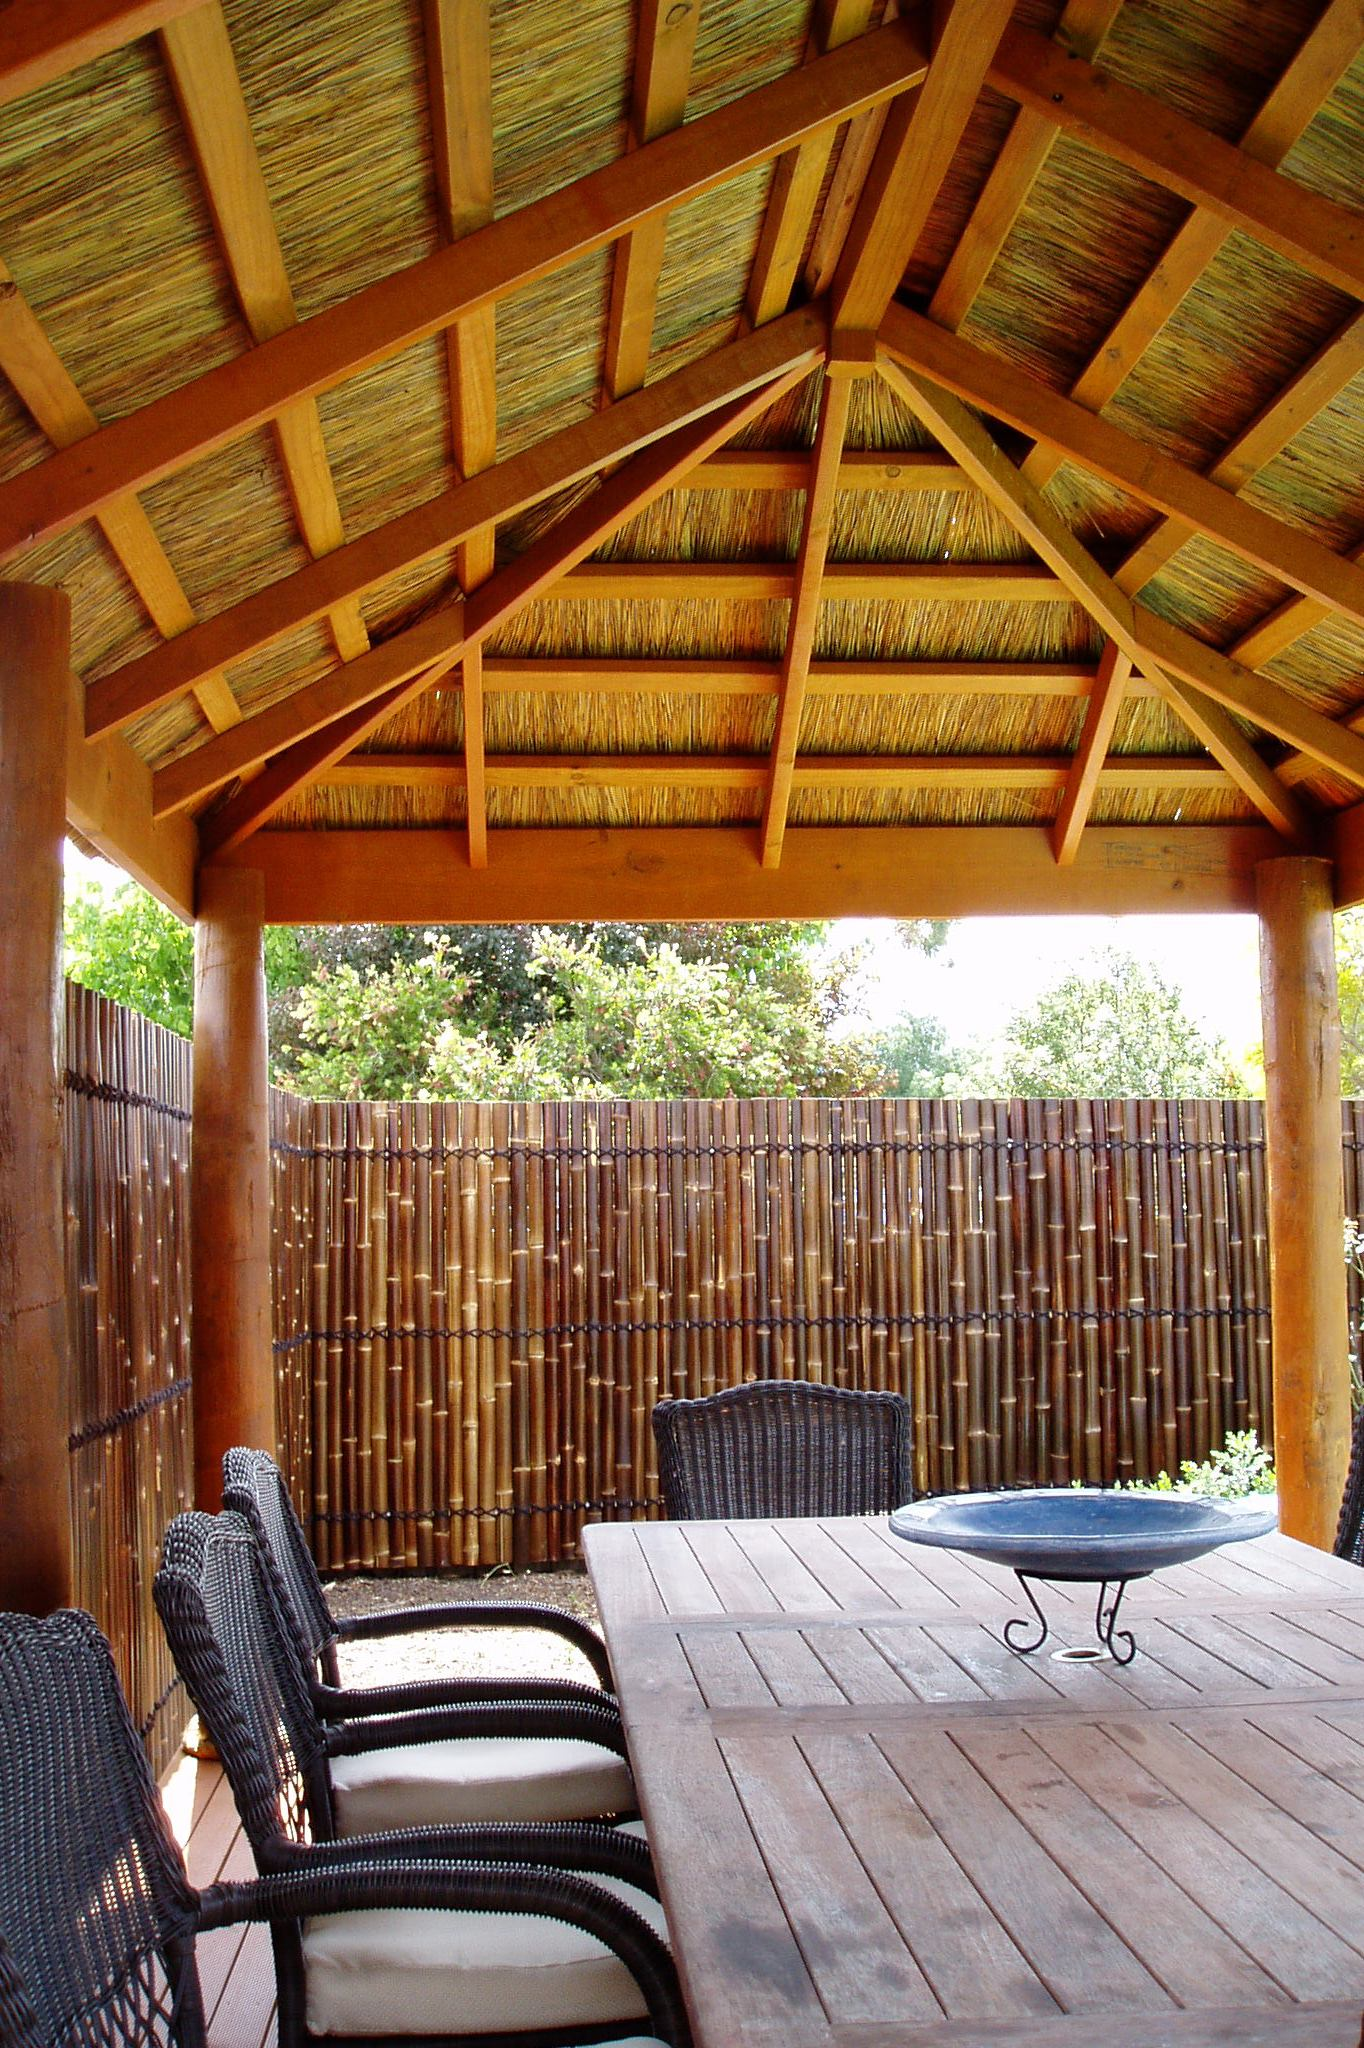 Thatch Roofing Gallery Balihutsandoutdoorgazebos